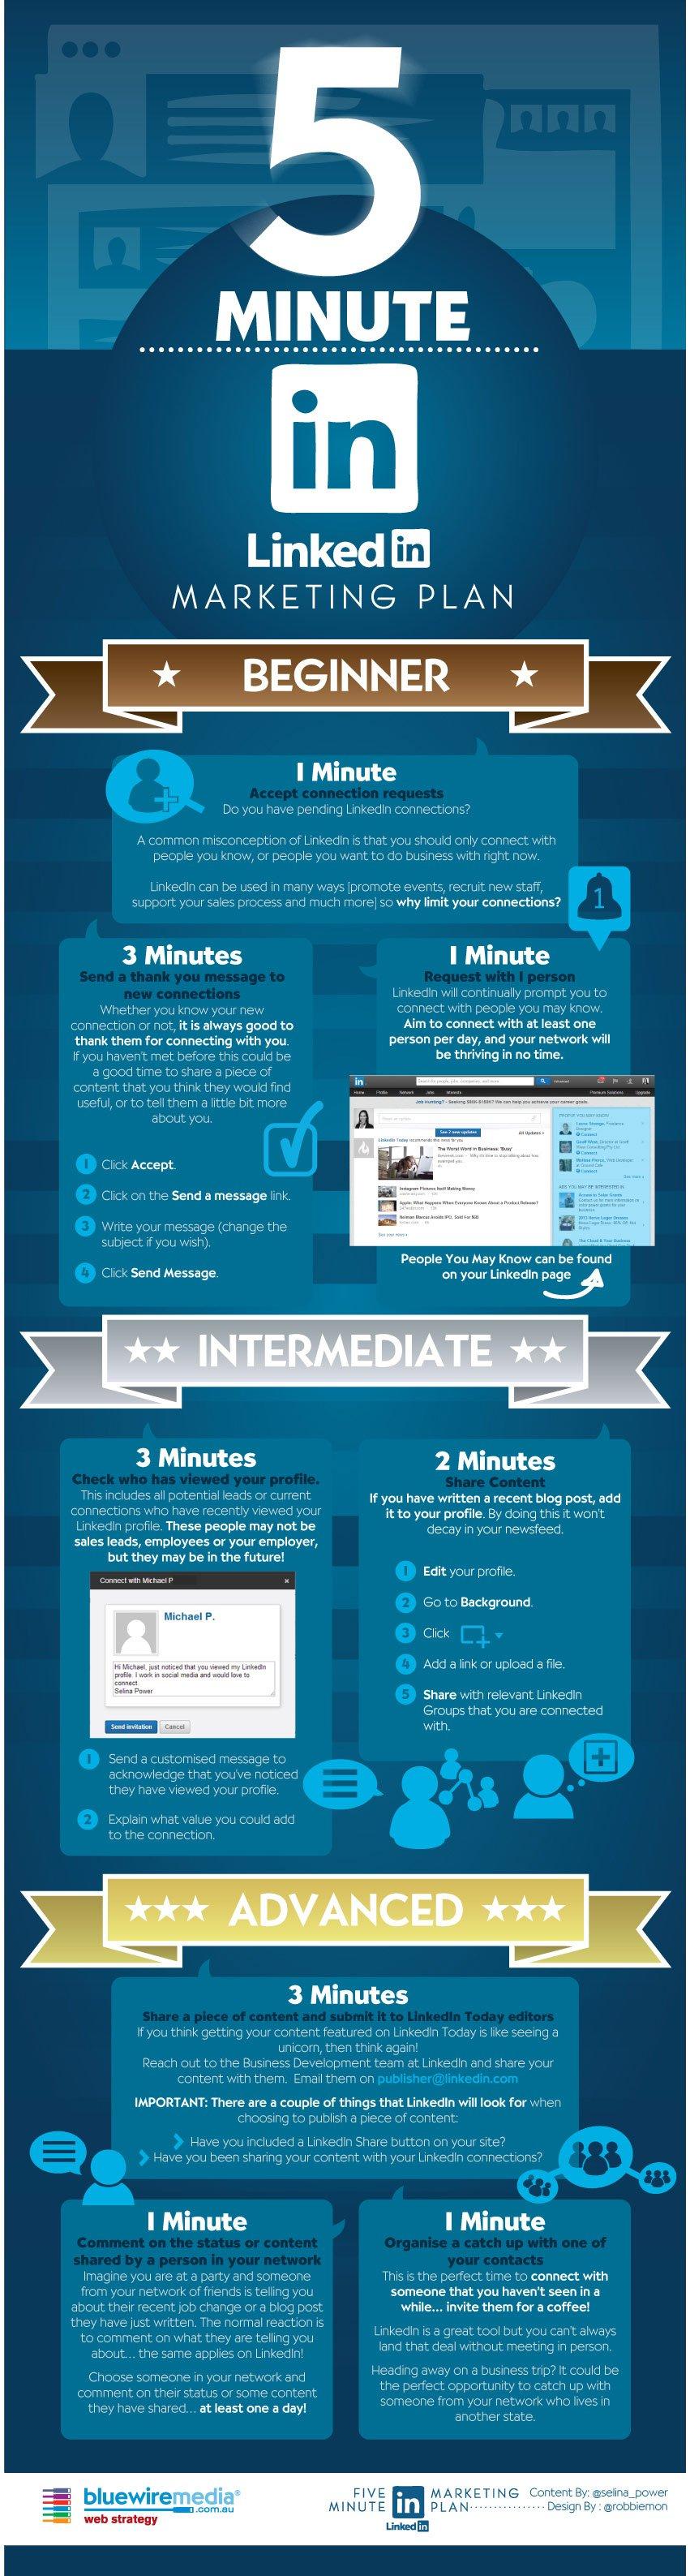 Master In LinkedIn Marketing in 5 minutes